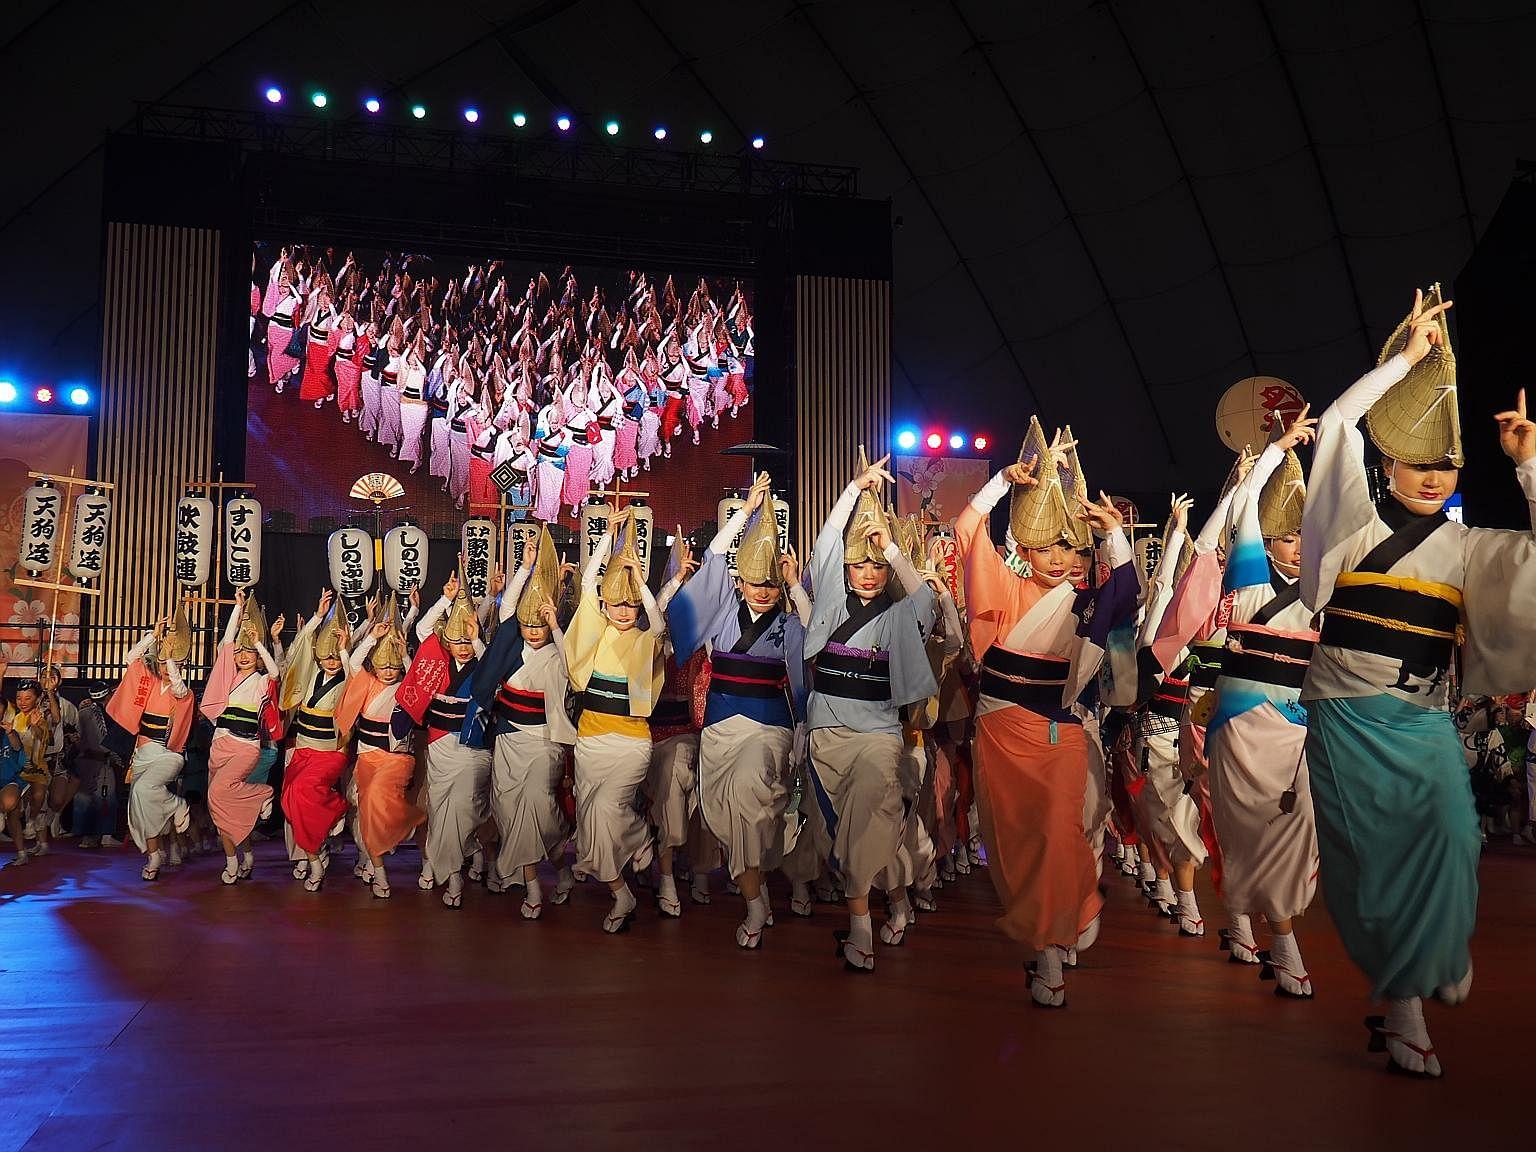 At RWS Summer Matsuri, kids can enjoy Japanese films, try Japanese food and catch live performances of the Tokyo Koenji Awa-Odori dance.